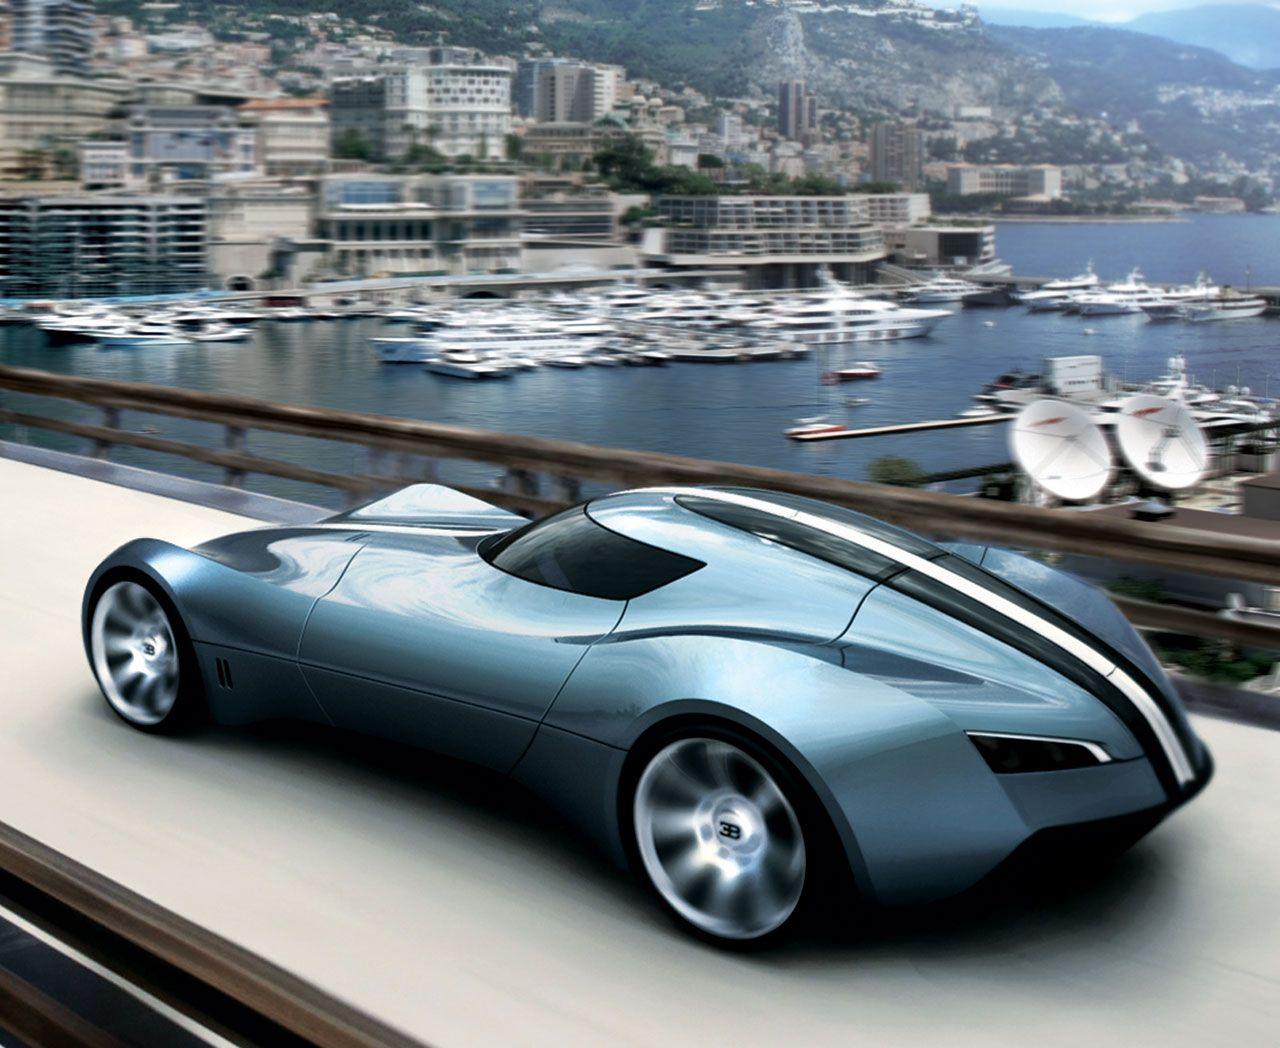 Bugatti Aerolithe Concept in Monaco. Not very original http://www.dieselstation.com/cars/saab-aerox-concept-a422.html